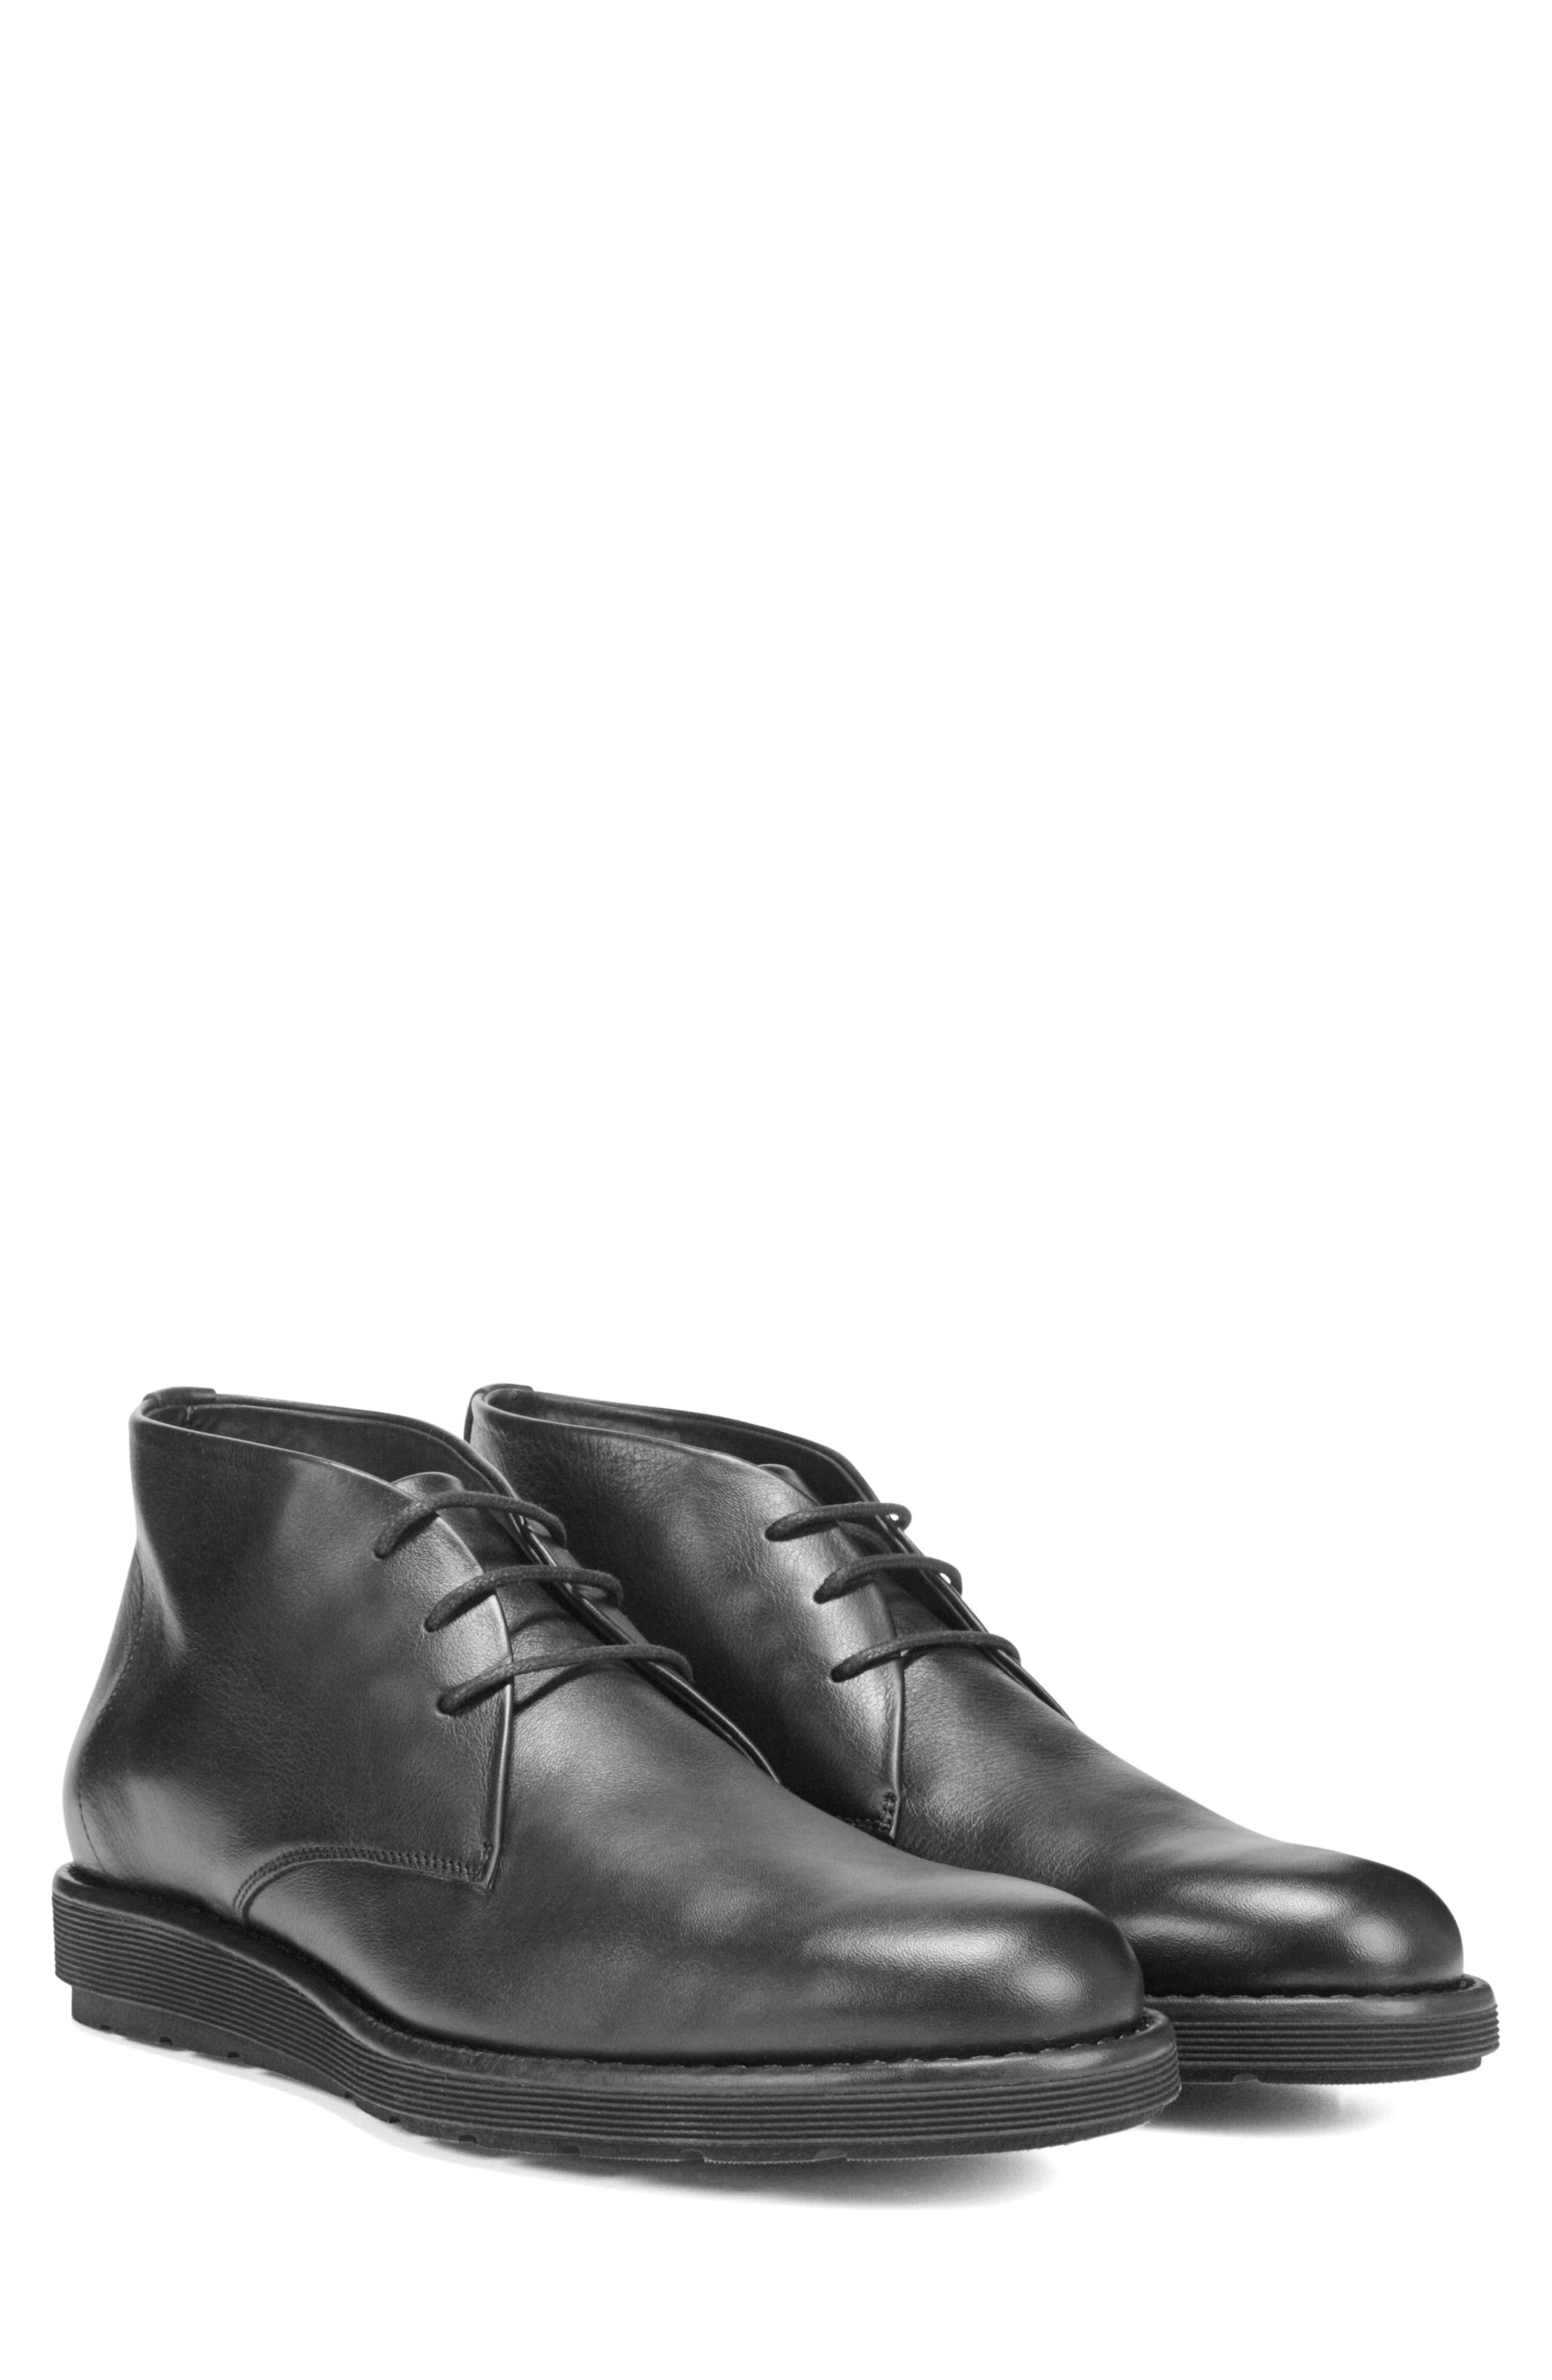 Walden Chukka Boot,                             Alternate thumbnail 8, color,                             BLACK